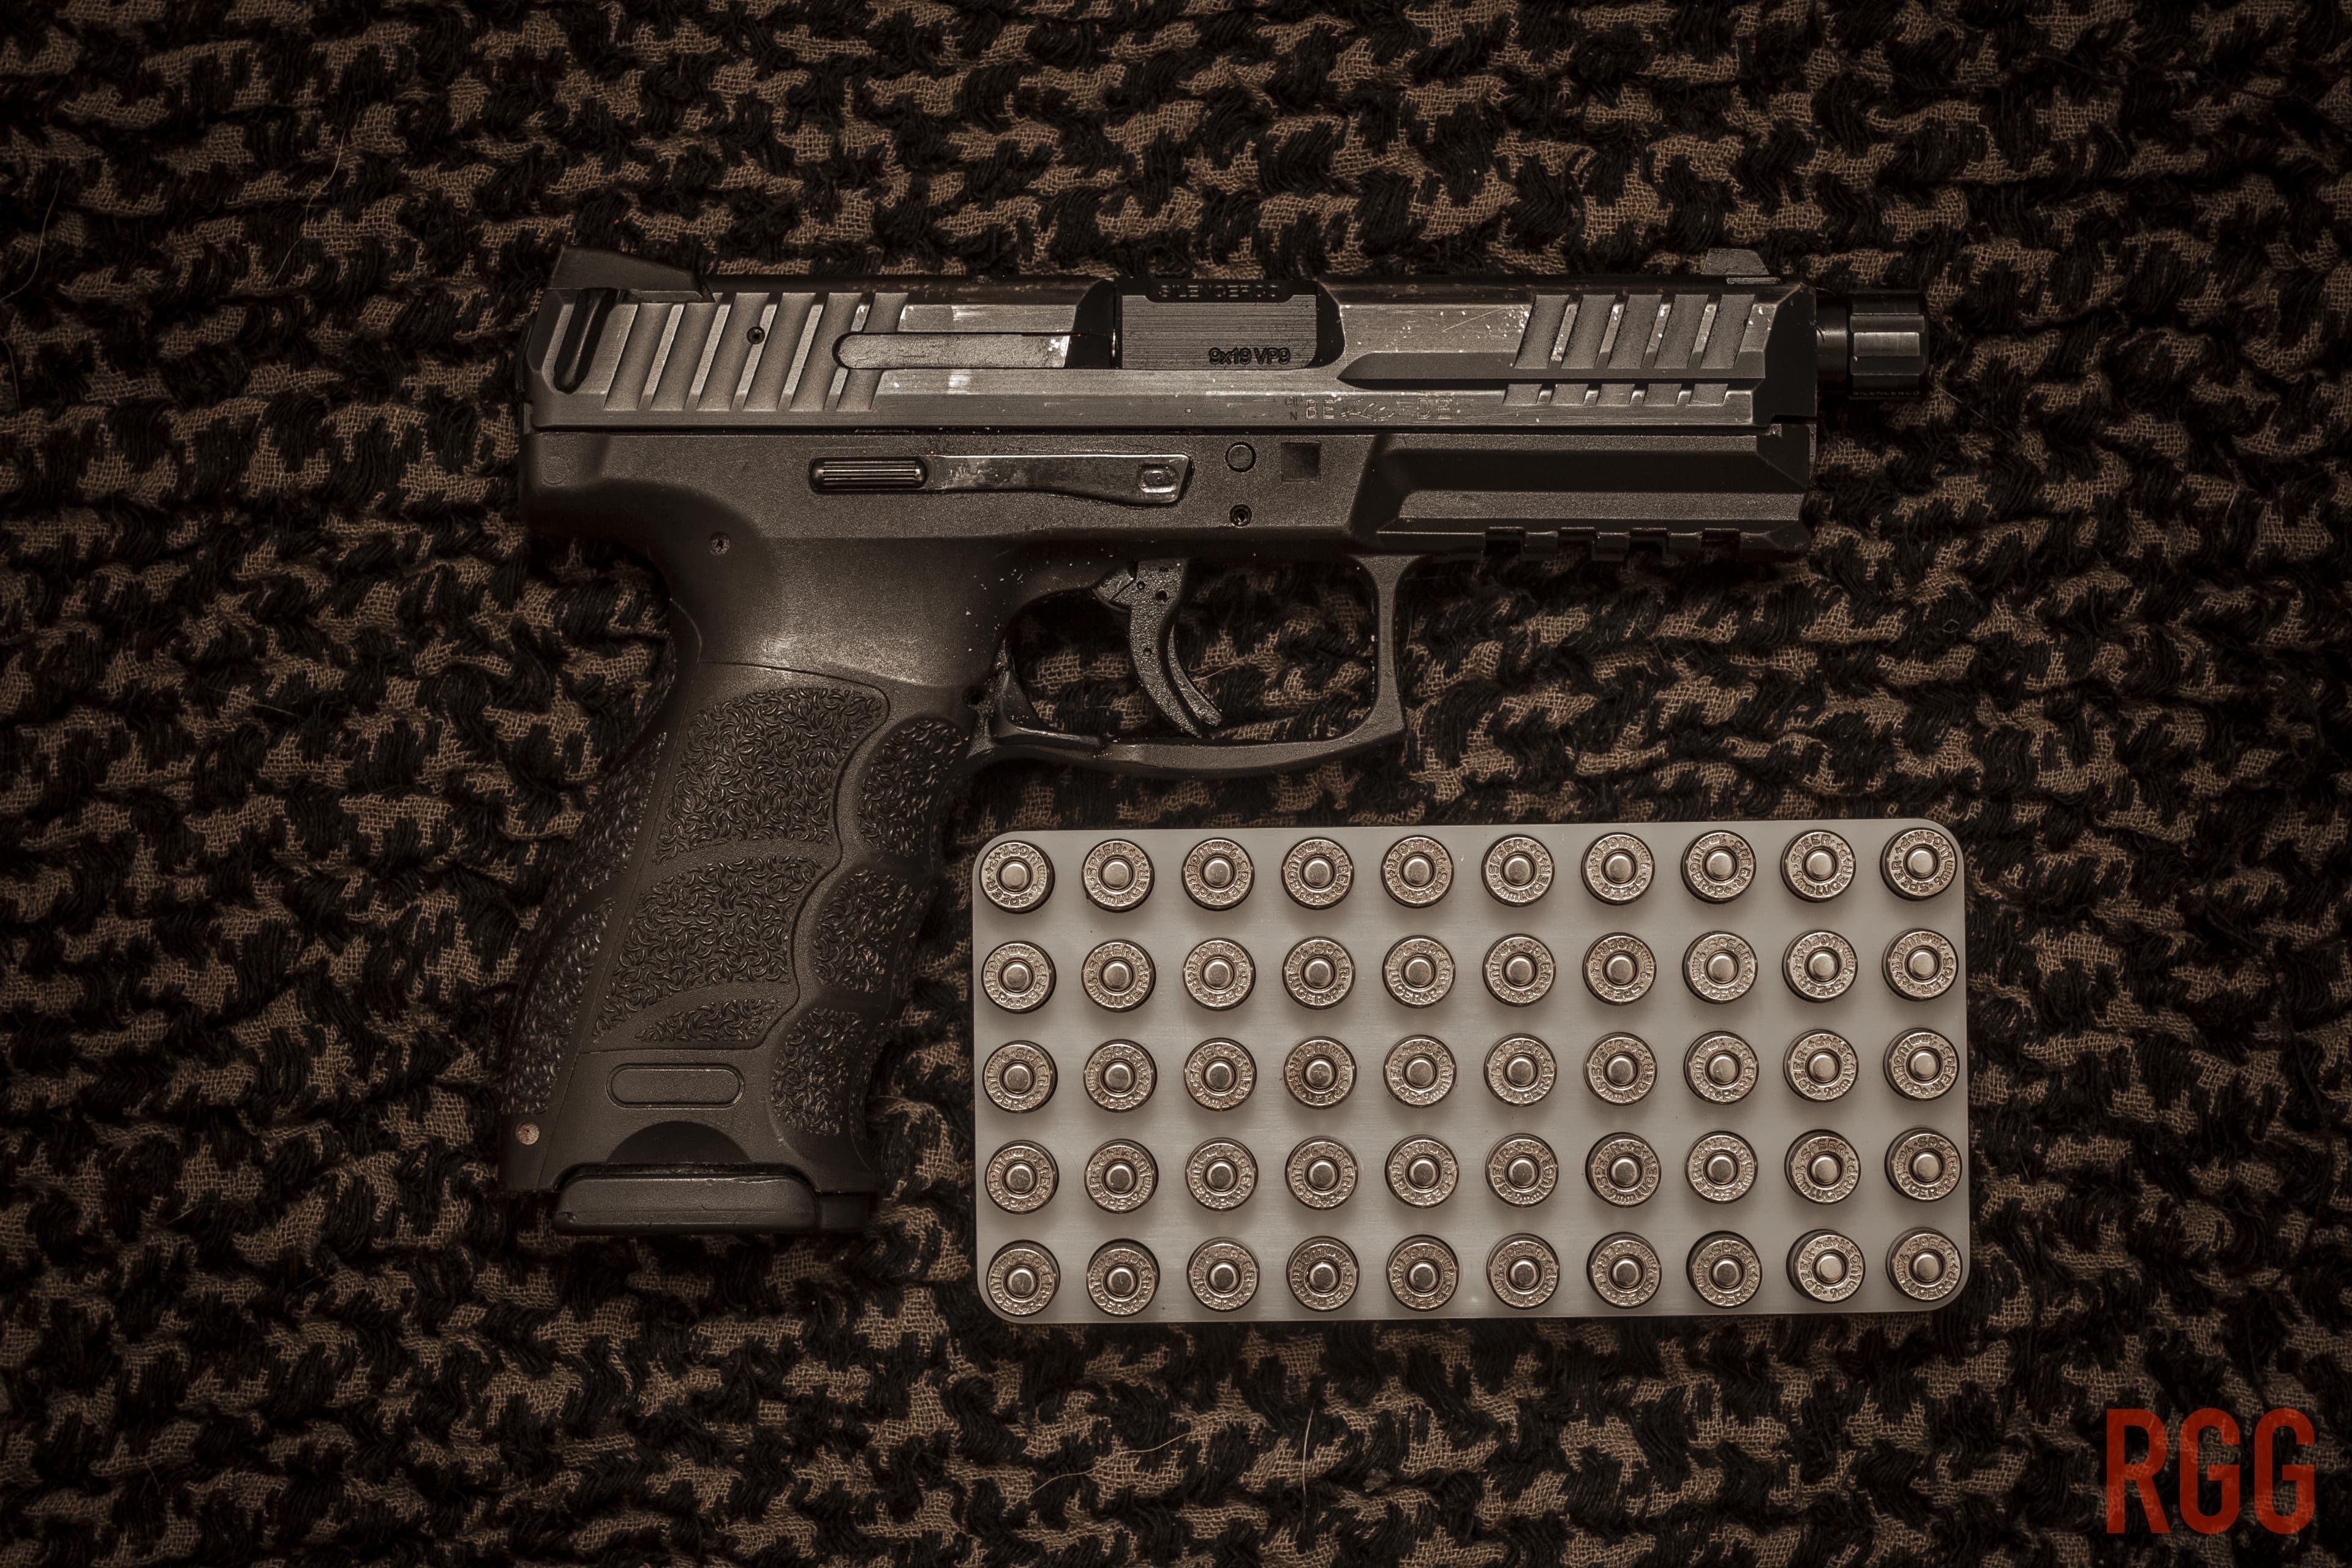 A Heckler & Koch VP9 Pistol and Speer 9mm 115gr +P+ Gold Dot Hollow Point Ammo.